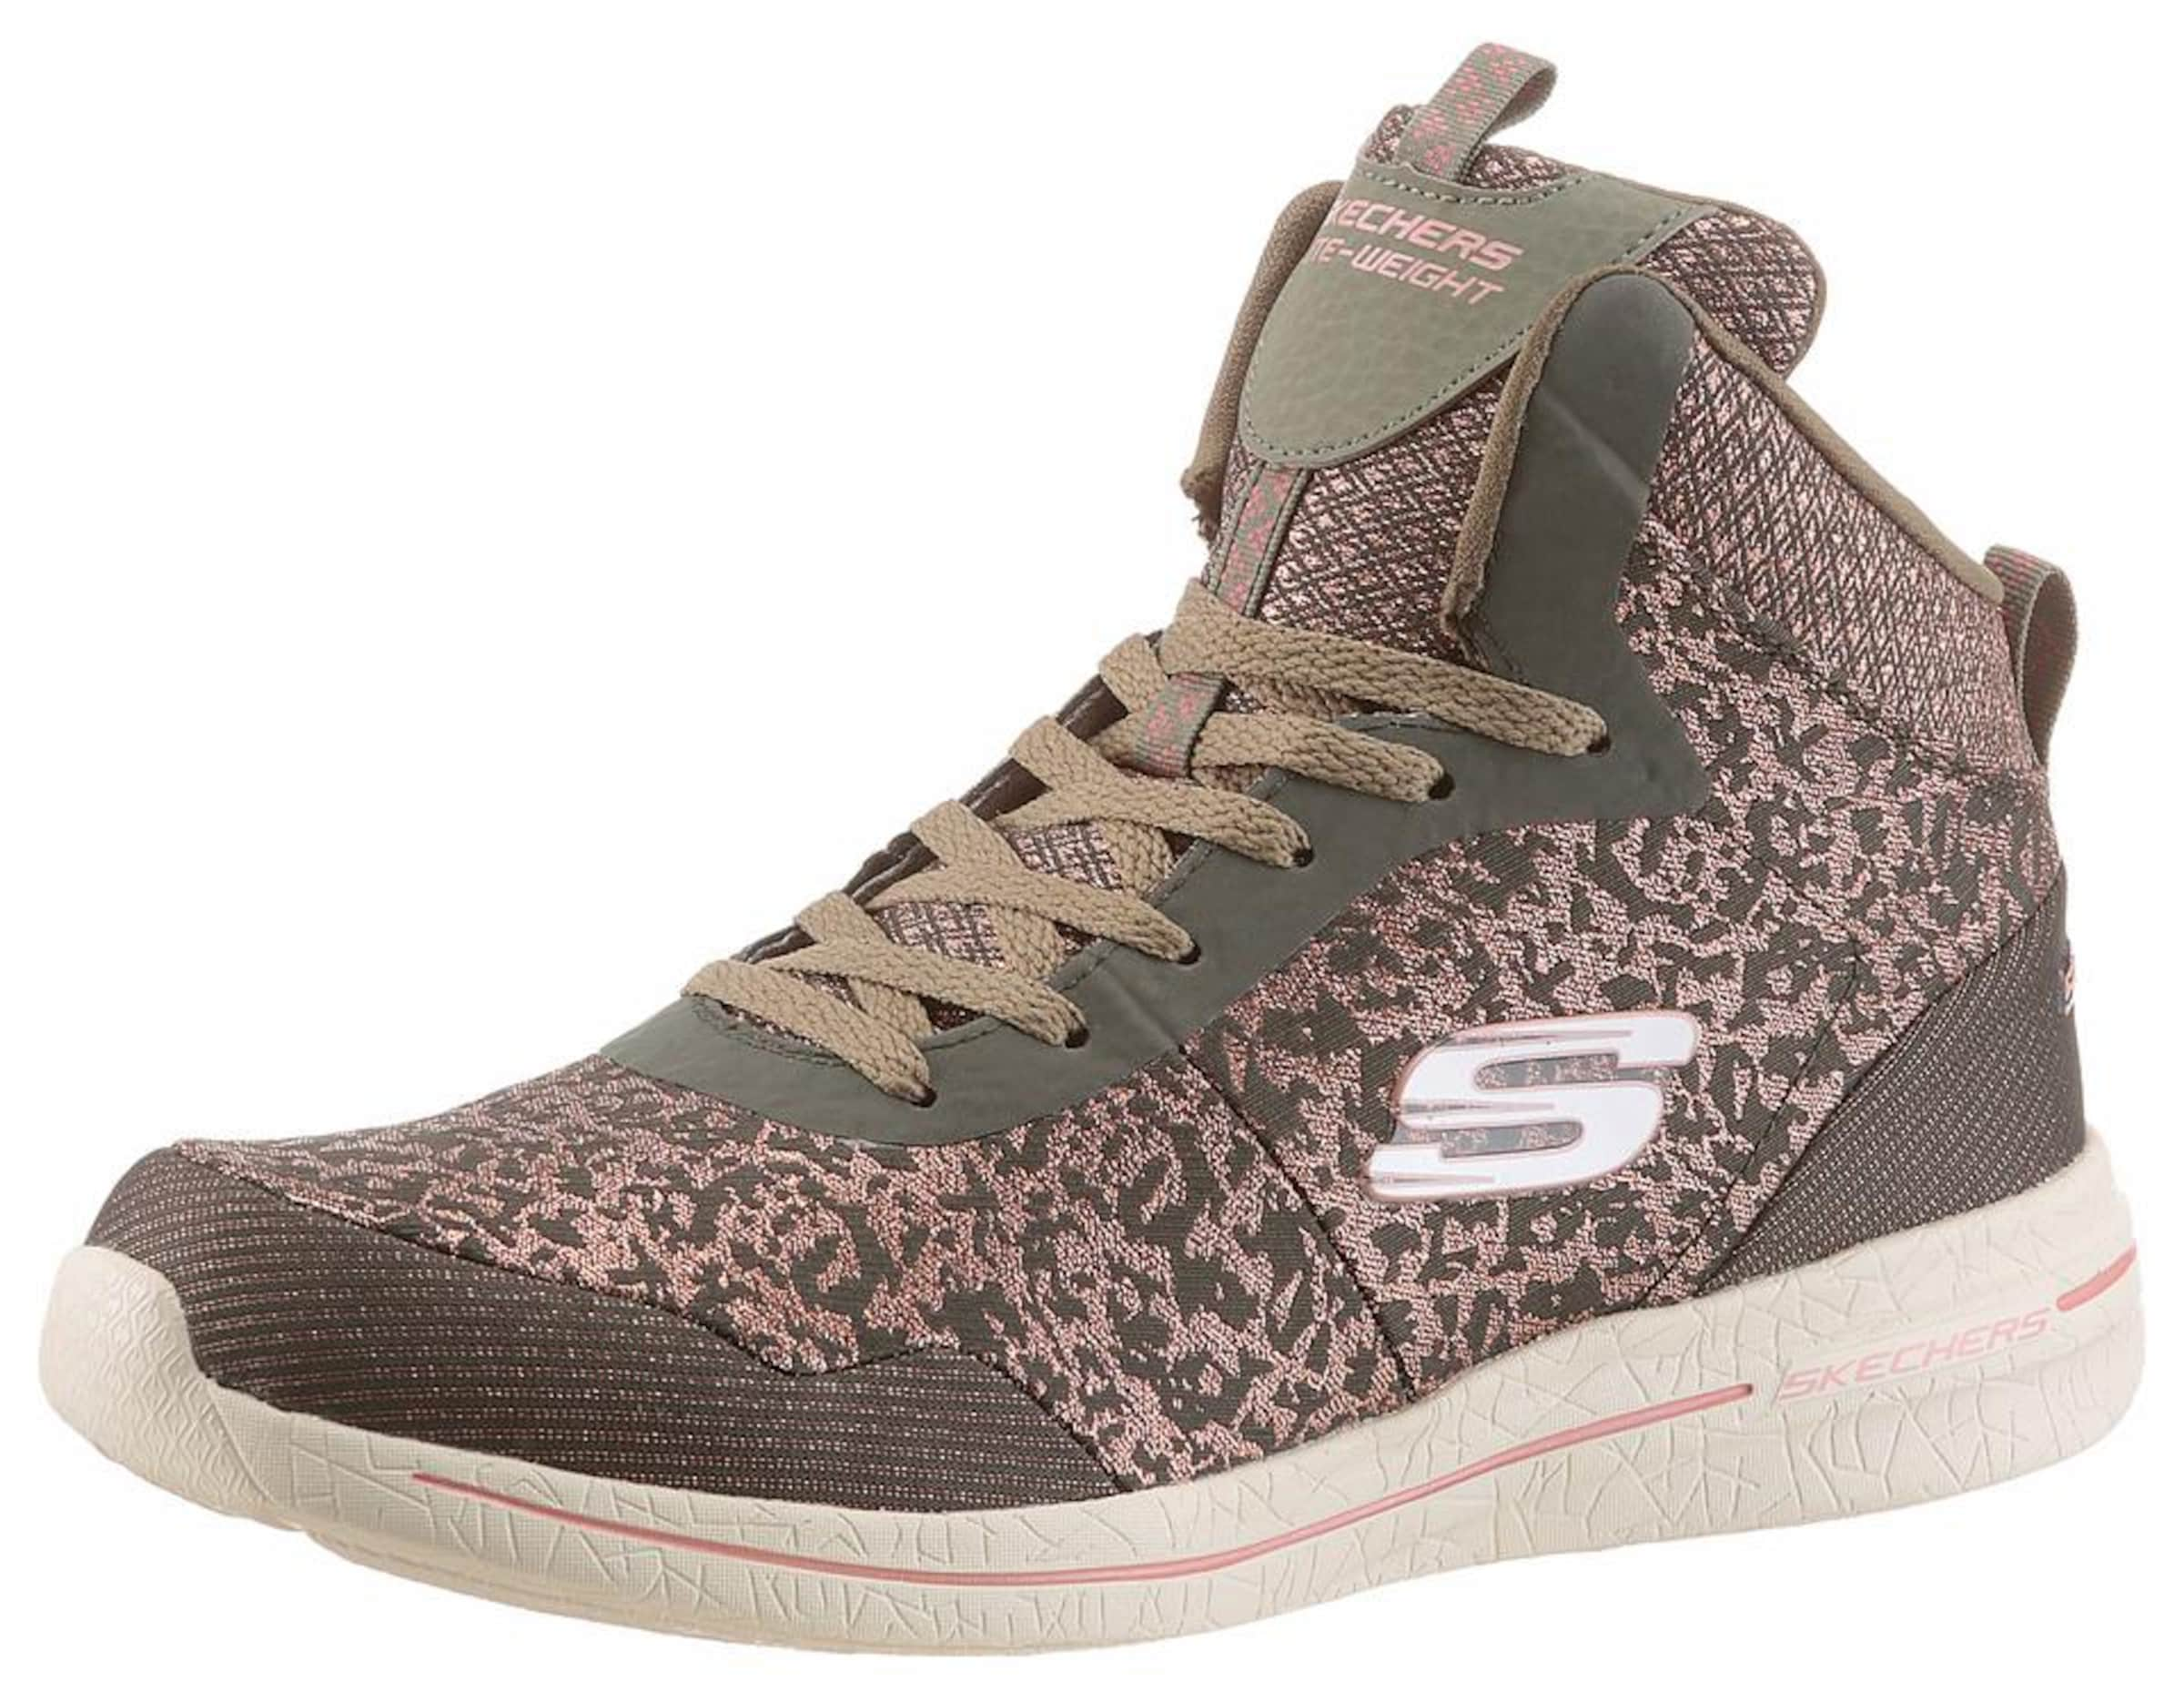 SKECHERS Sneaker Burst 2.0 Fashion Forwad